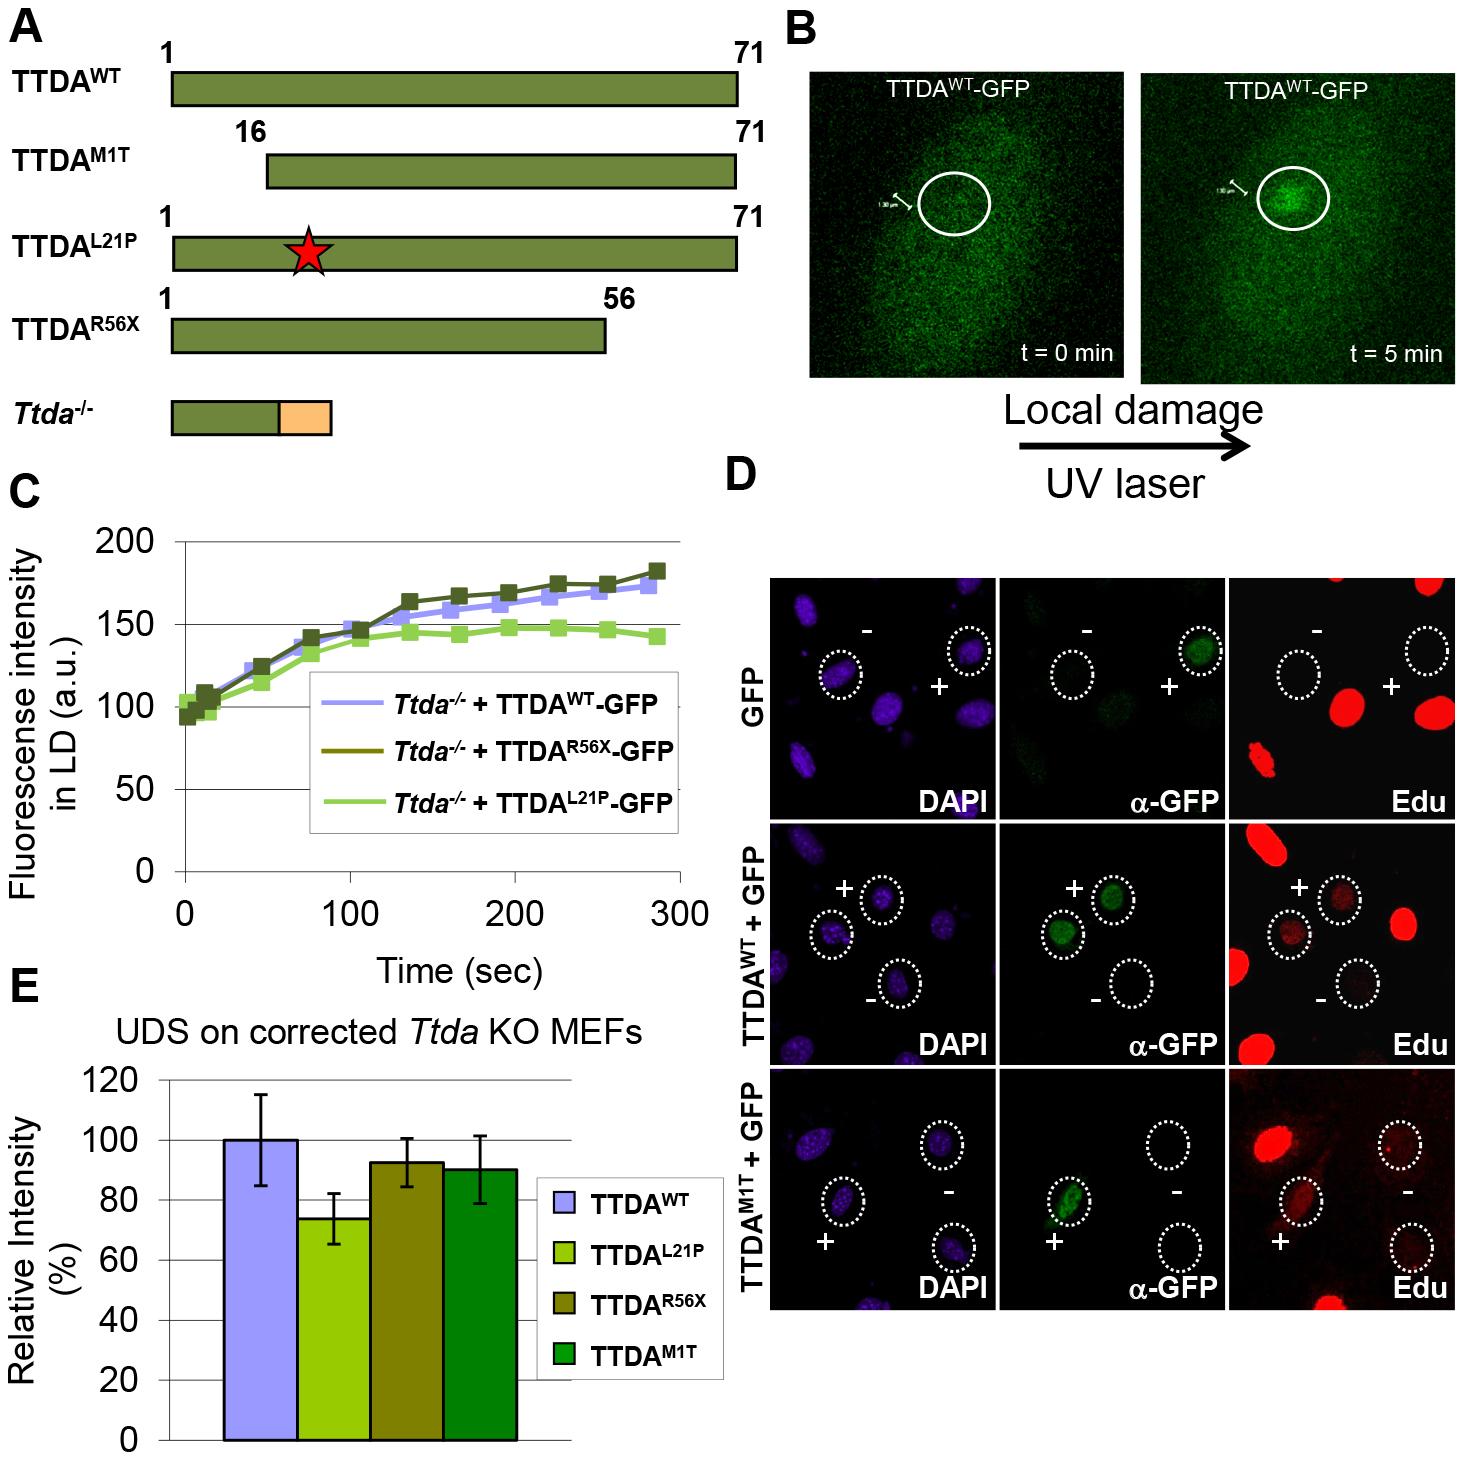 Mutant TTDA protein accumulation at local UV damage.